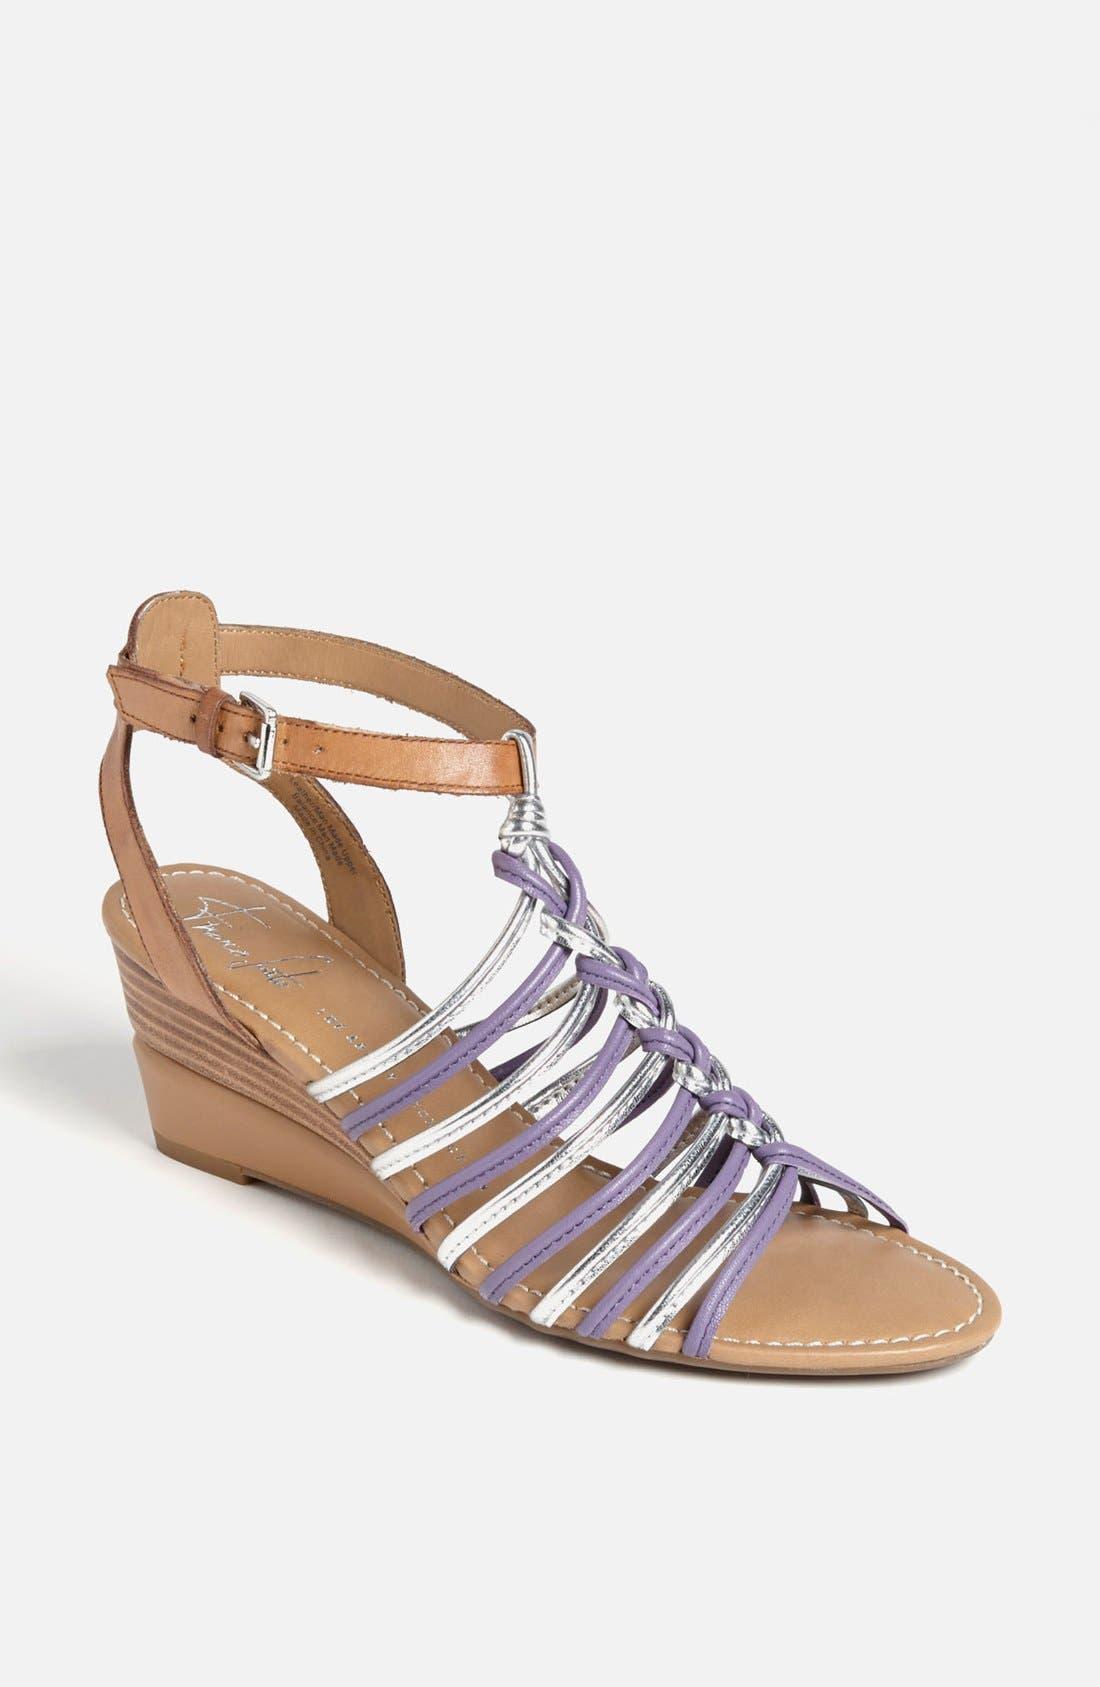 Alternate Image 1 Selected - Franco Sarto 'Everly' Wedge Sandal